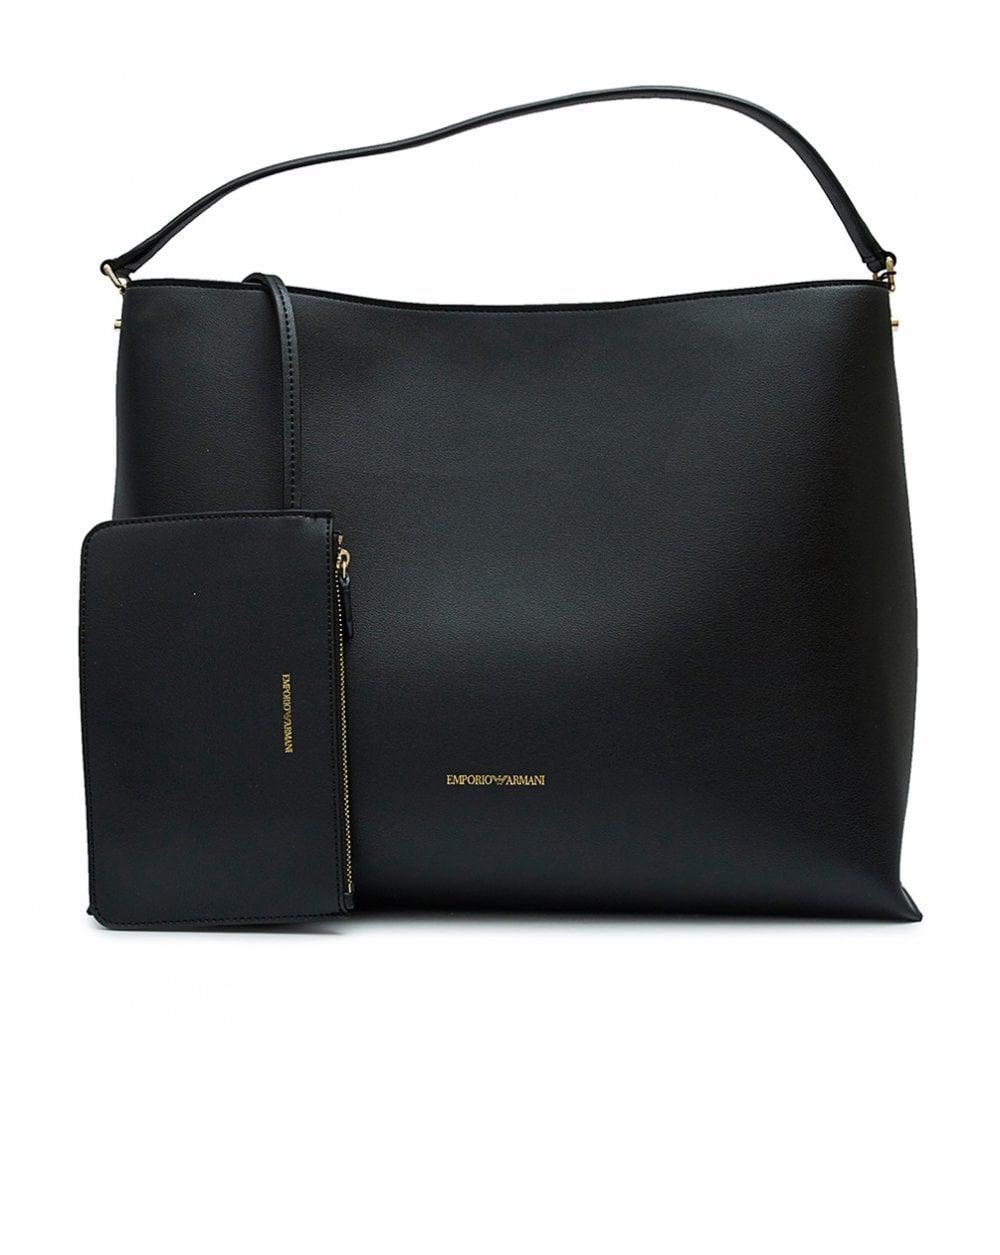 c04a0b5bce9a Emporio Armani - Black Oversized Shopper - Lyst. View fullscreen